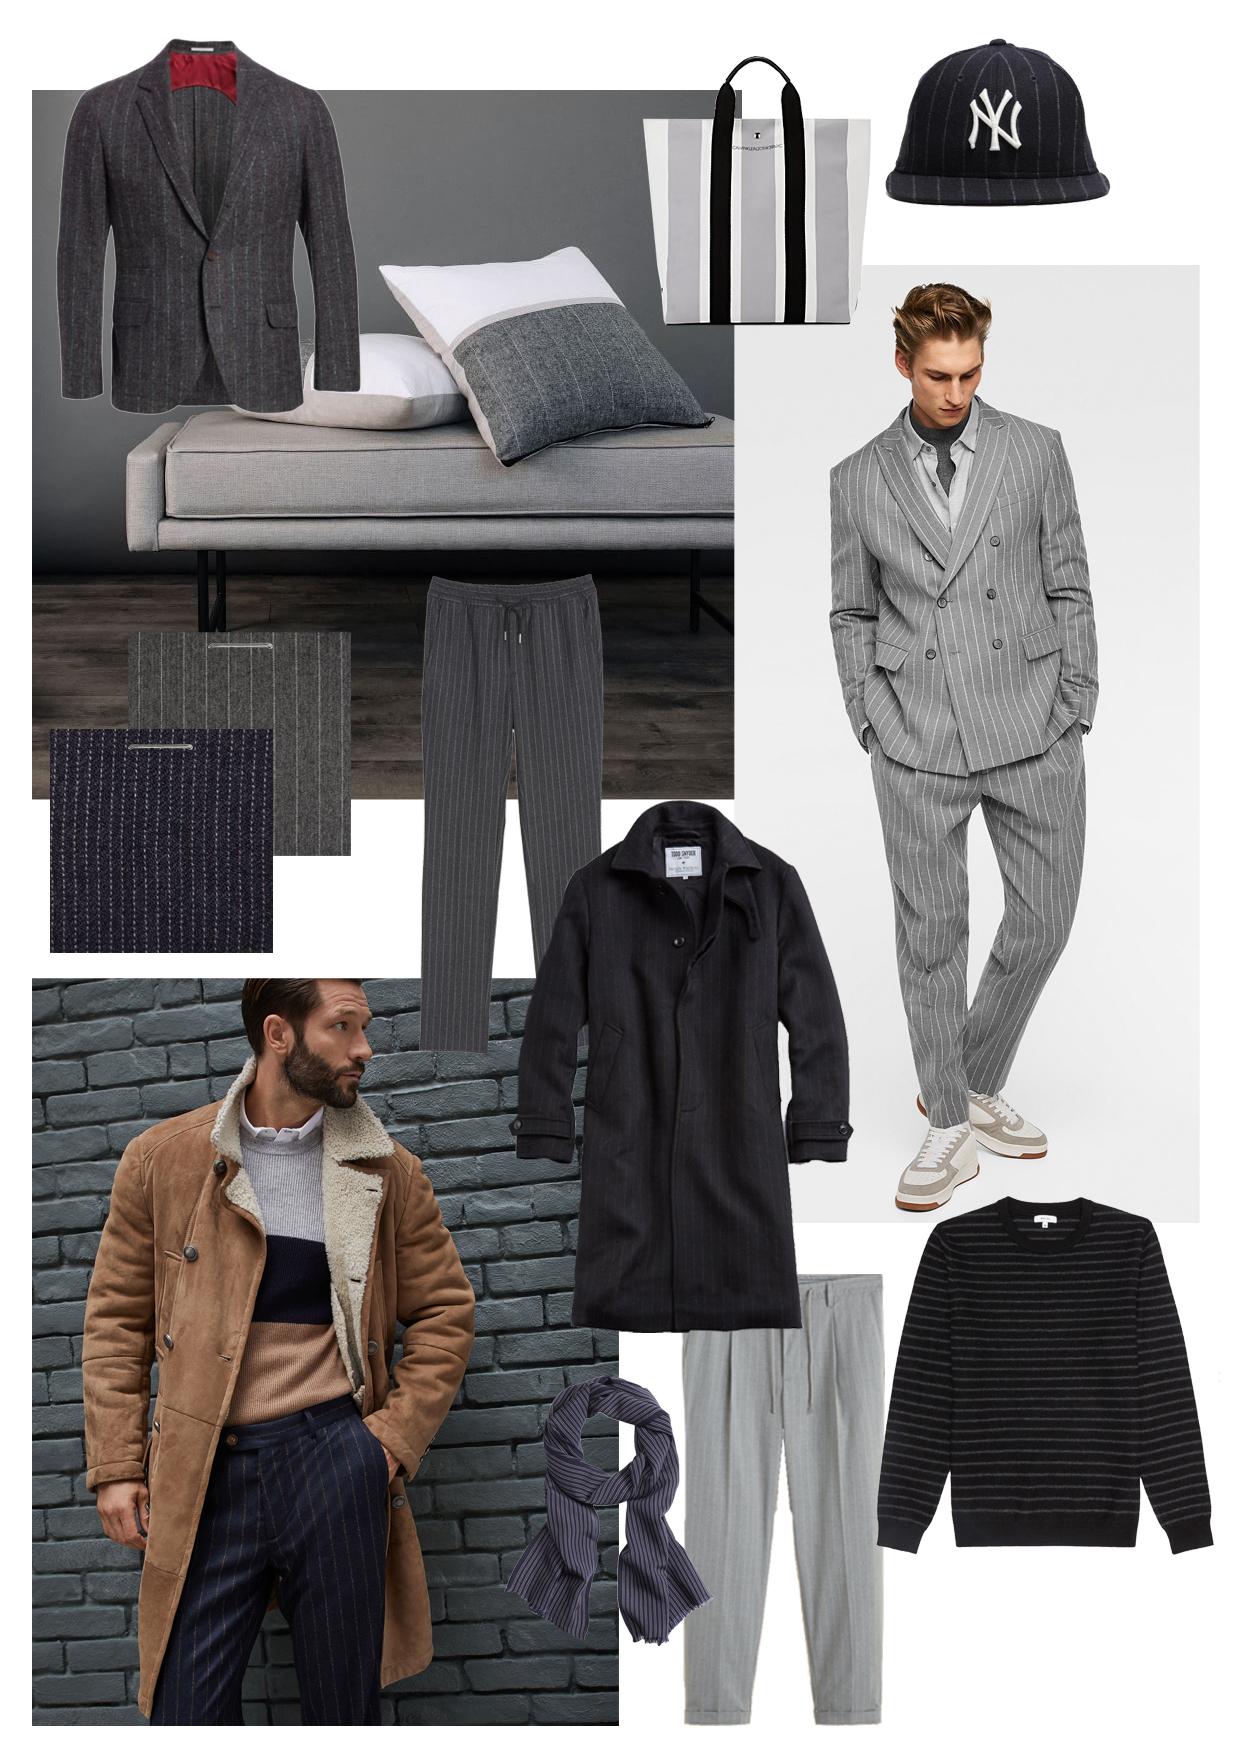 Pinstripe Menswear Trend | The Modern Otter